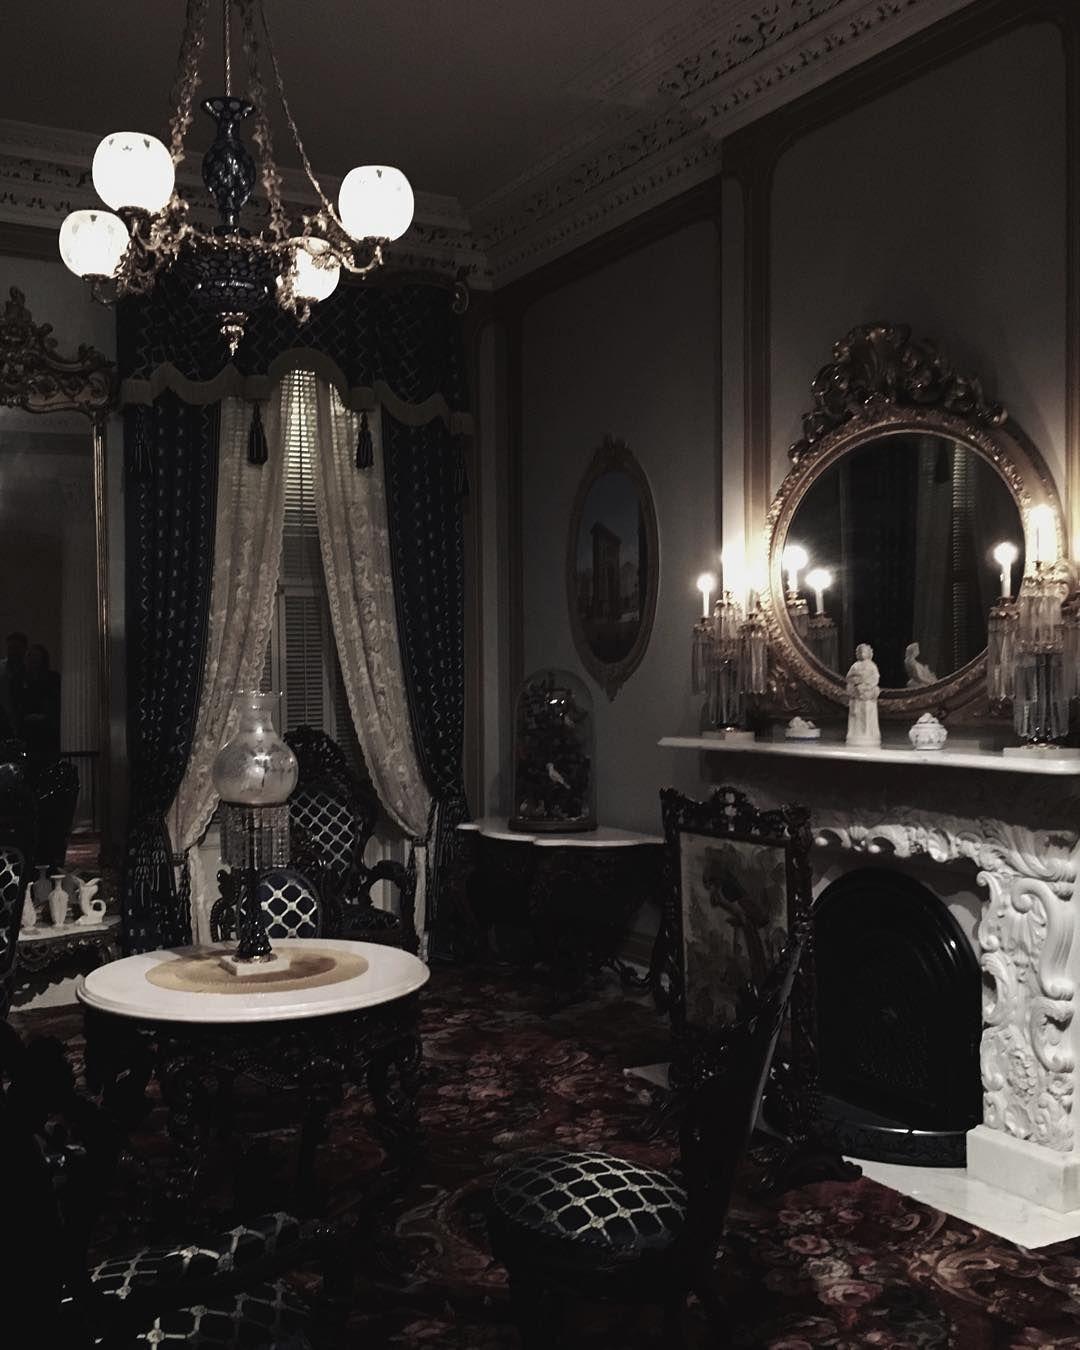 Victorian Room Design: 1,916 отметок «Нравится», 29 комментариев